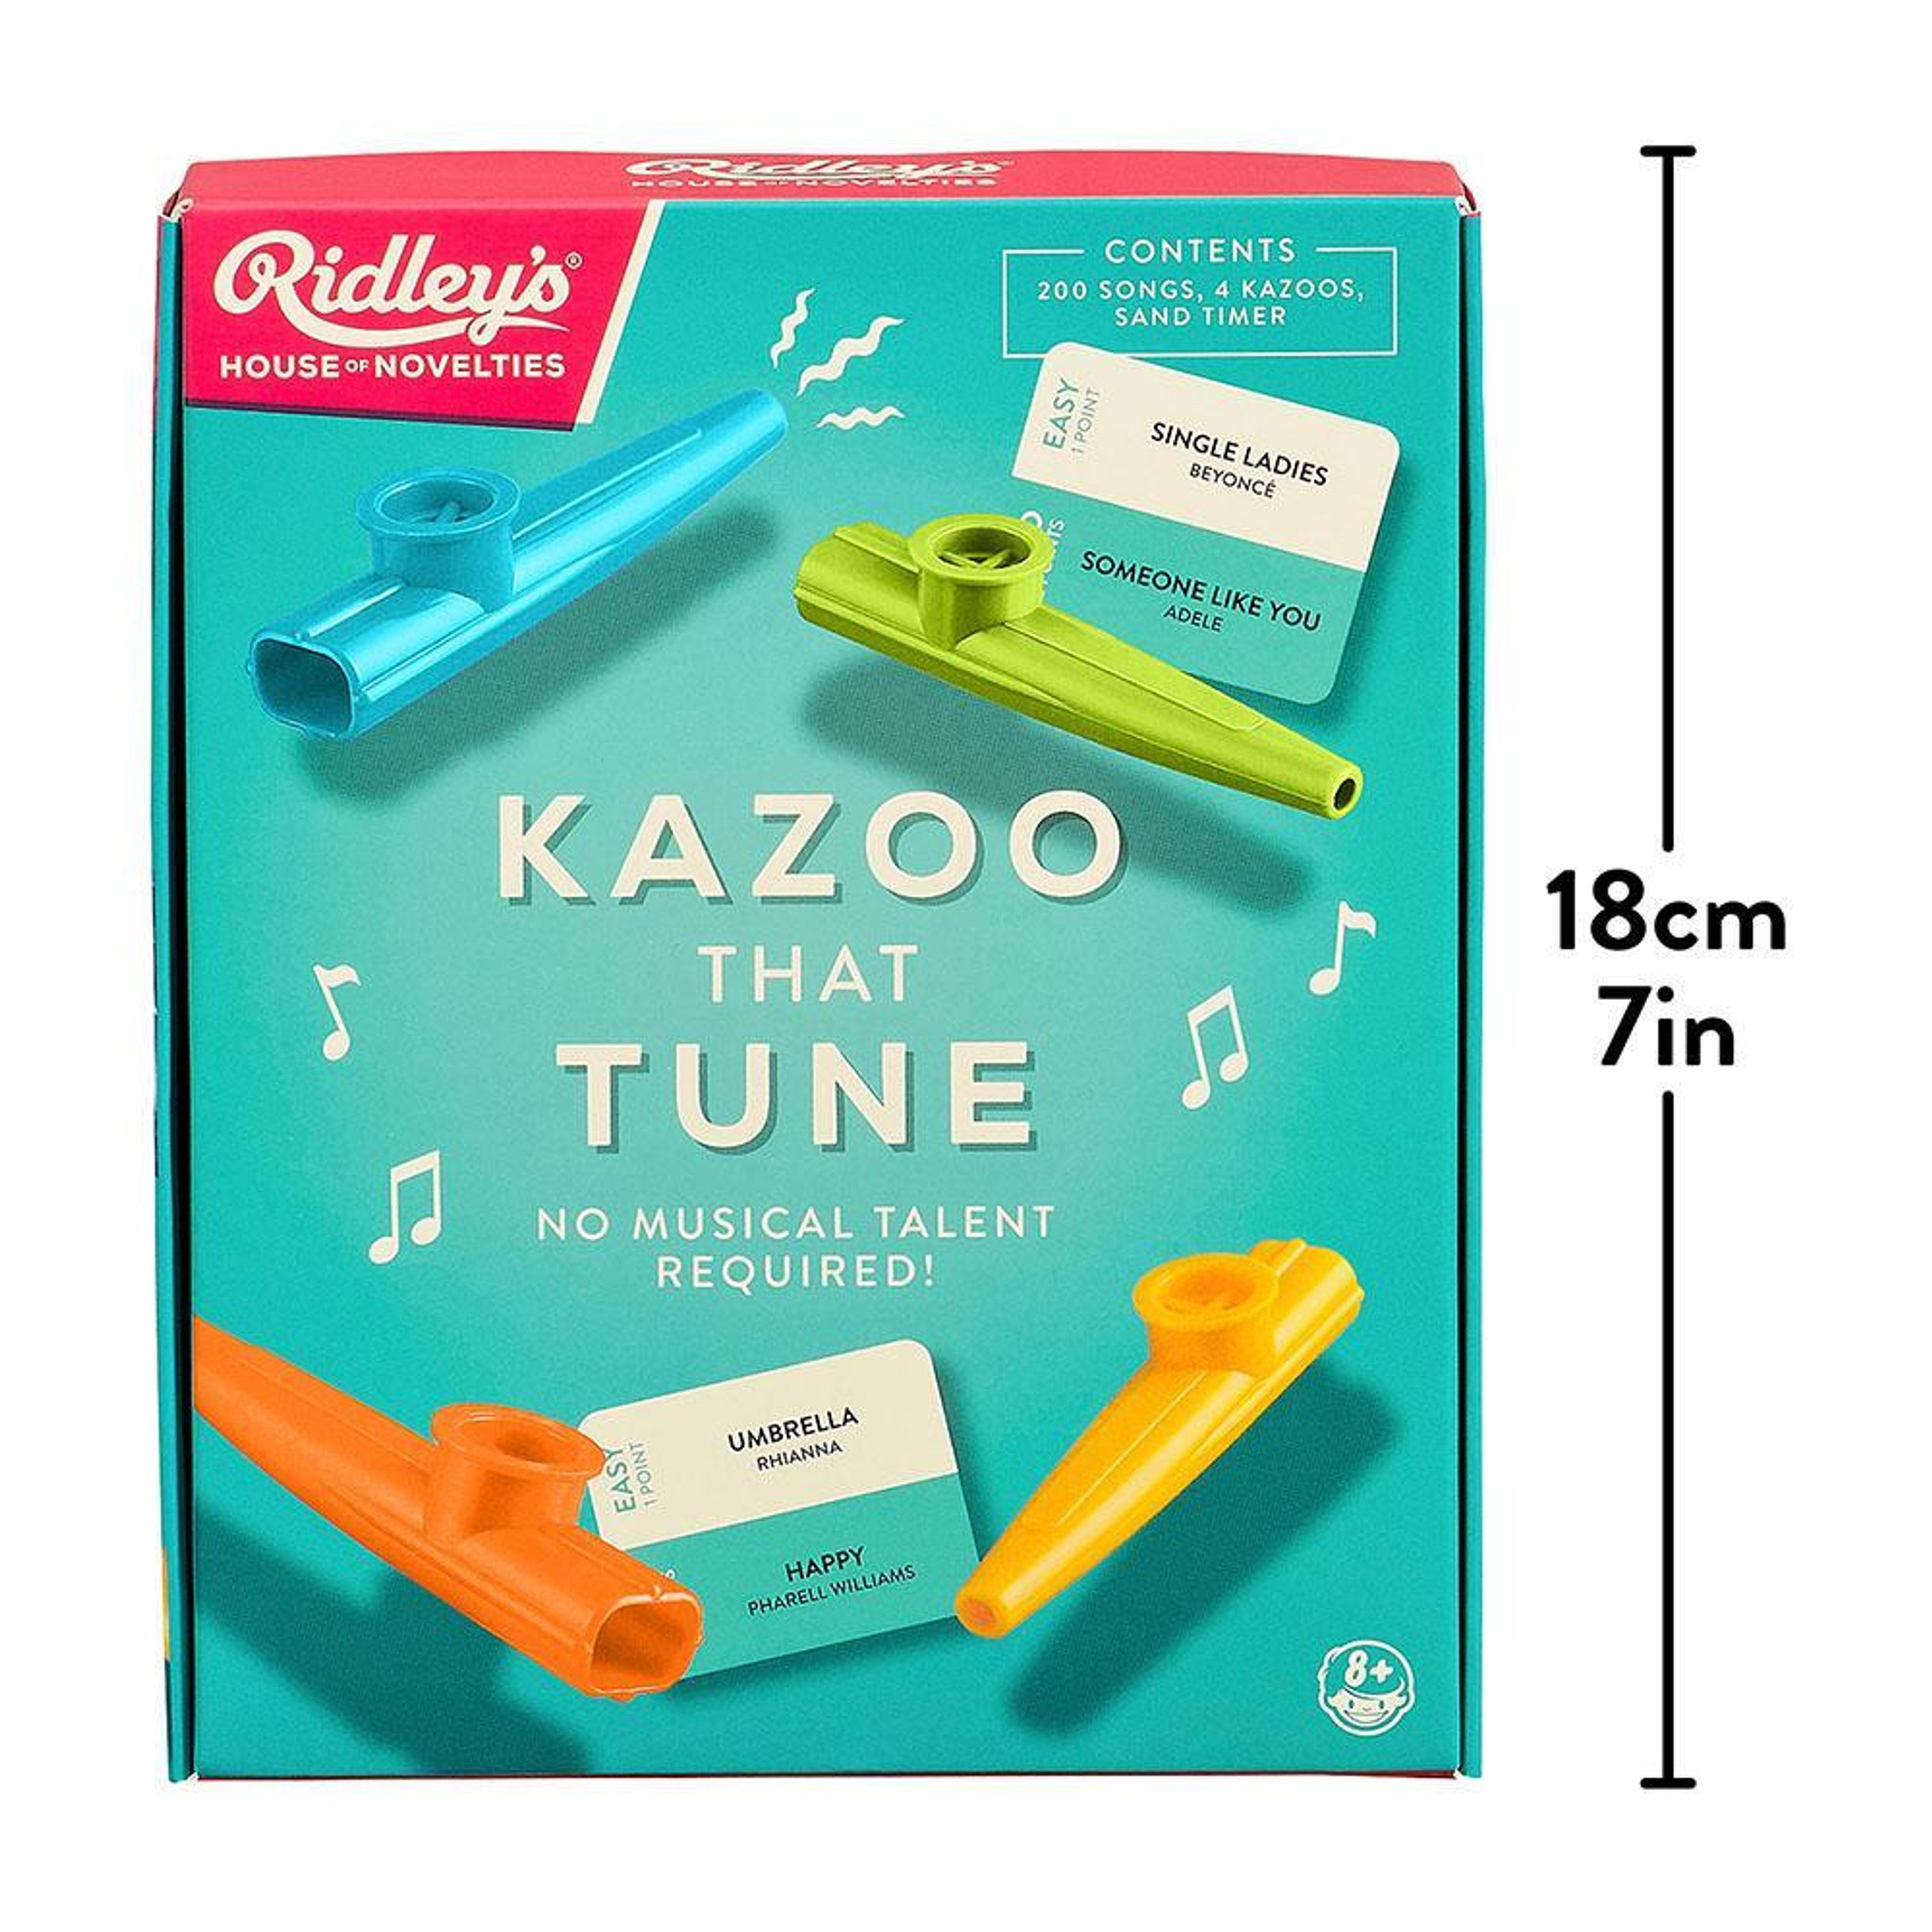 Ridley's Kazoo That Tune